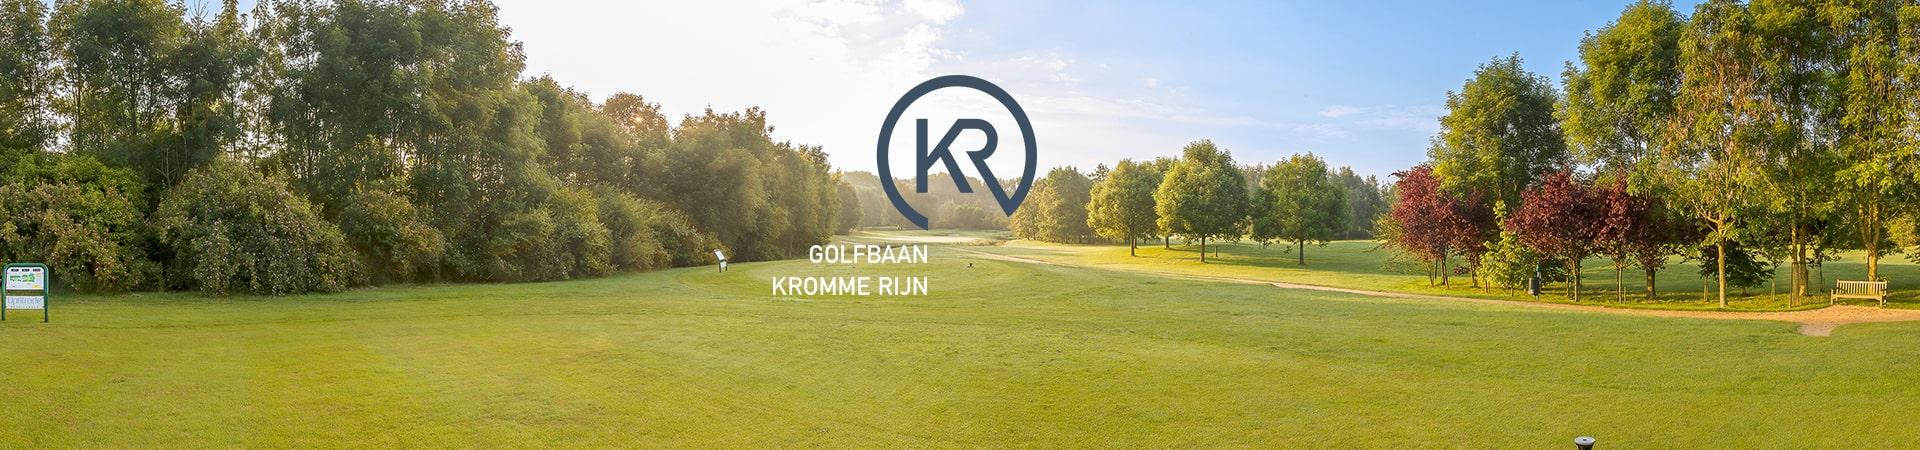 header golfbaan logo 04